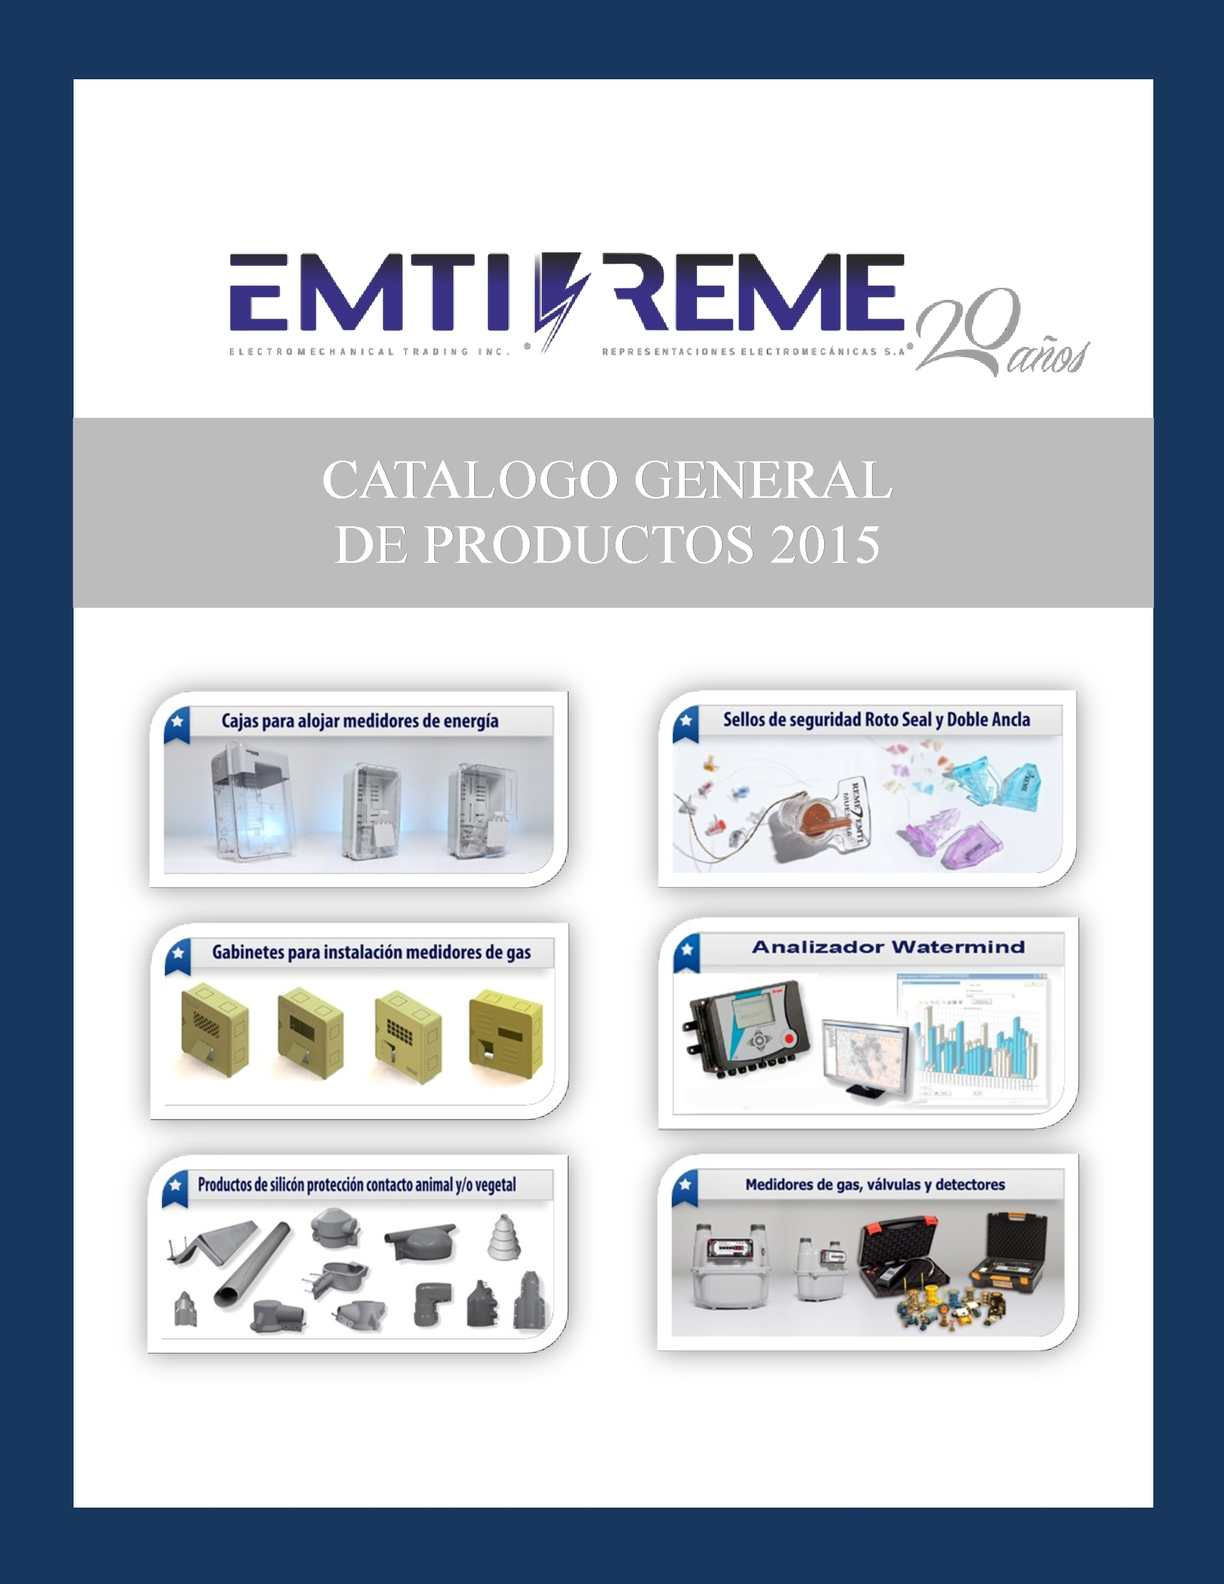 Catalogo General EMTI REME S.A.